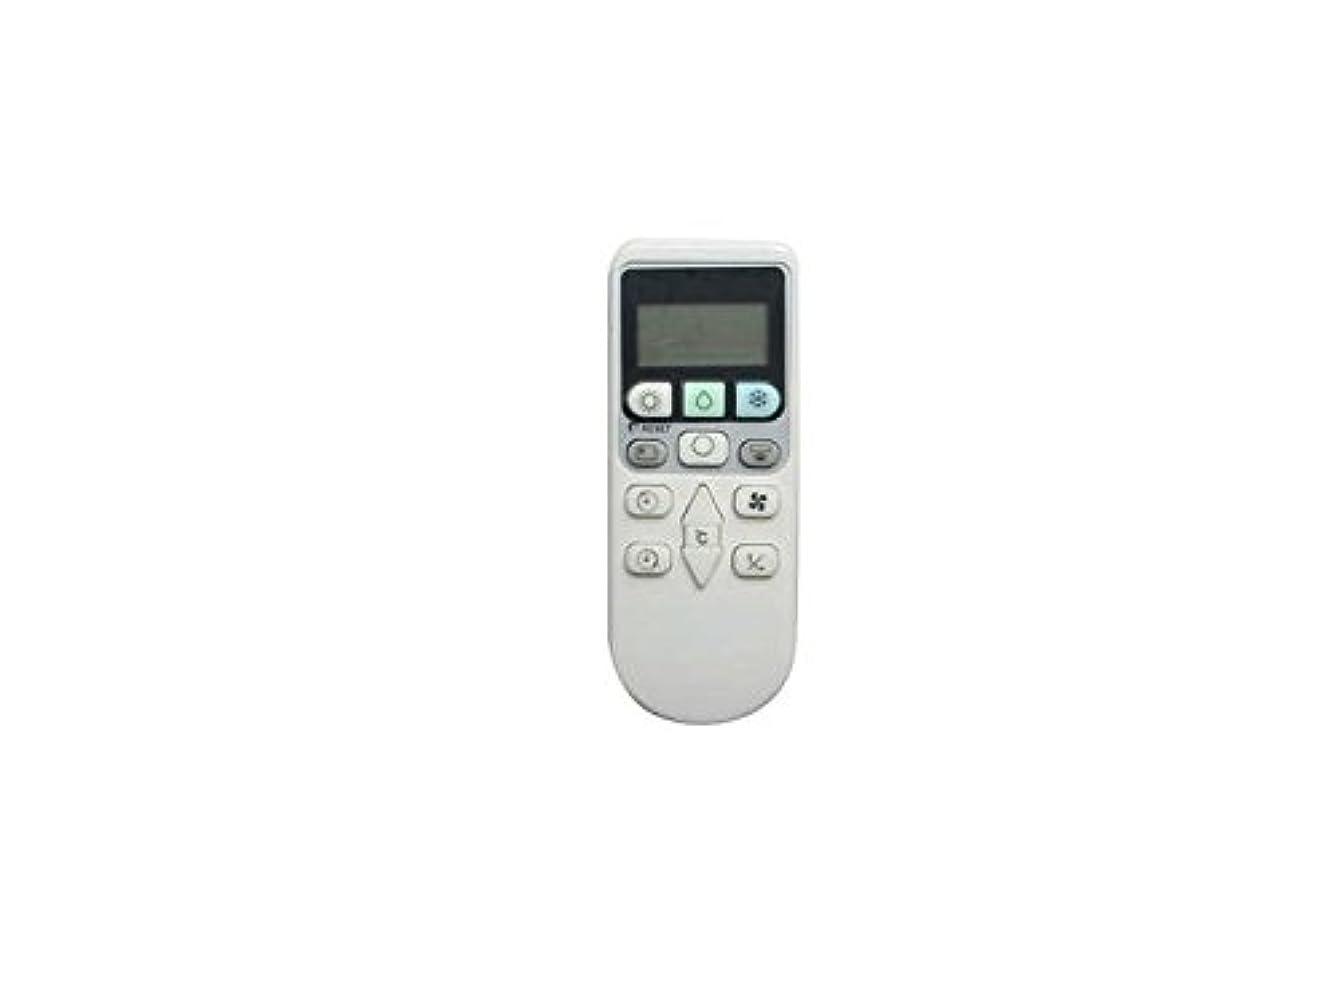 Easytry123 Remote Control For Hitachi RAS-S10CC RAS-E10HBG RAS-E14HB RAS-E14HBG RAS-S10CX RAS-5115CX RAS-S13CX A/C Air Conditioner